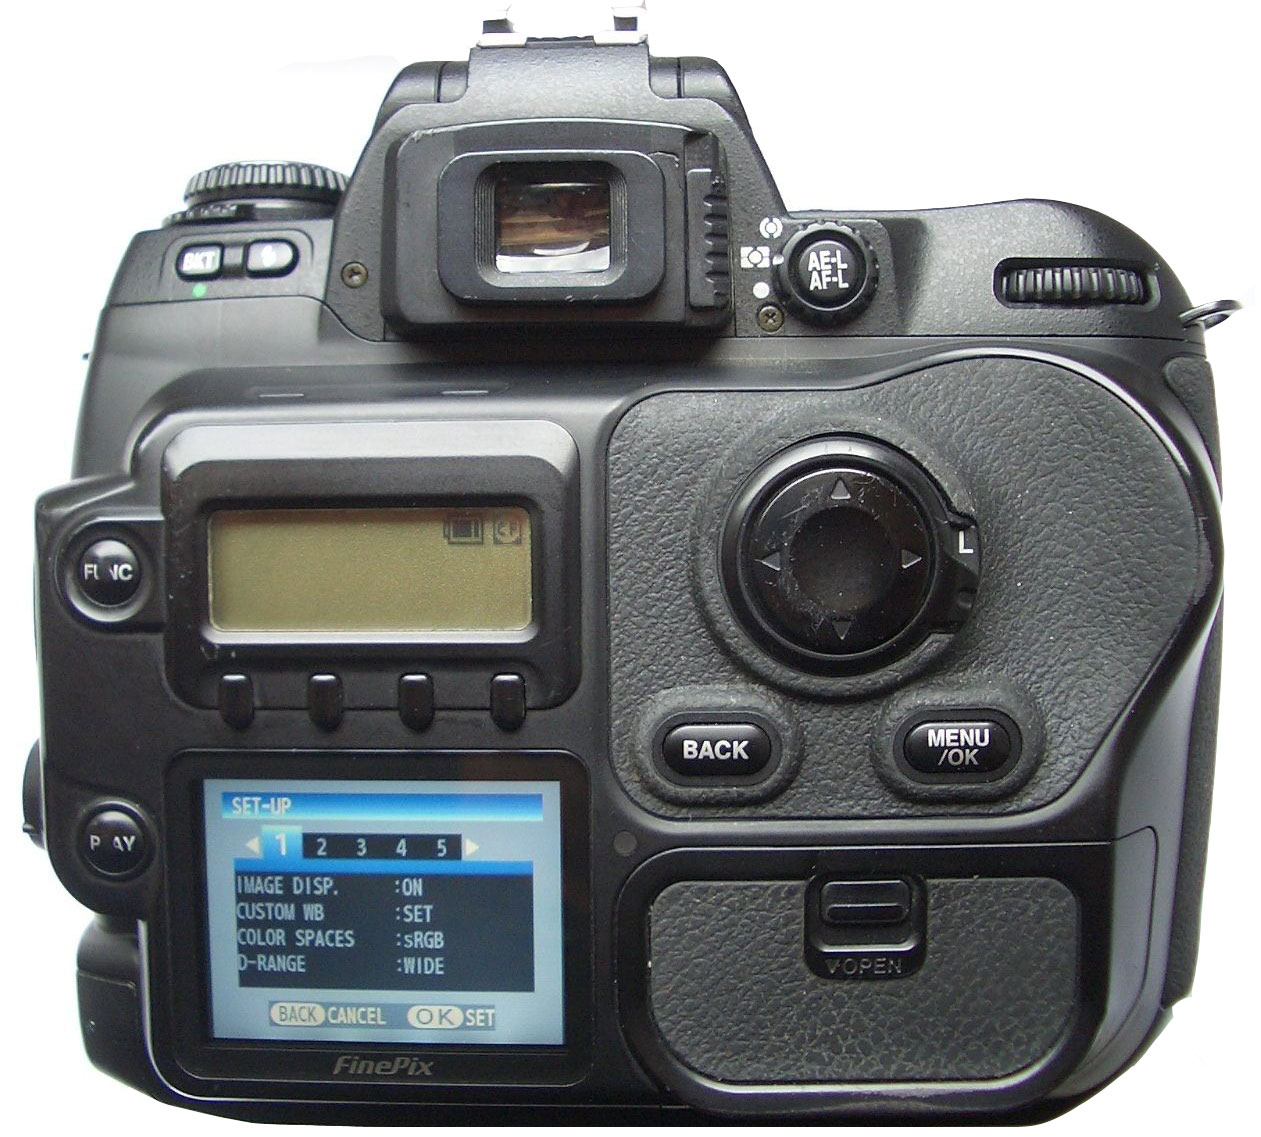 Nikon Slr Type Digital Cameras Kabel Data Usb D40 D40x D50 D60 D70 D70s D80 D90 D100 D200 D300 D300s D600 D610 D700 D3000 D3100 D7000 Fuji S3 Pro